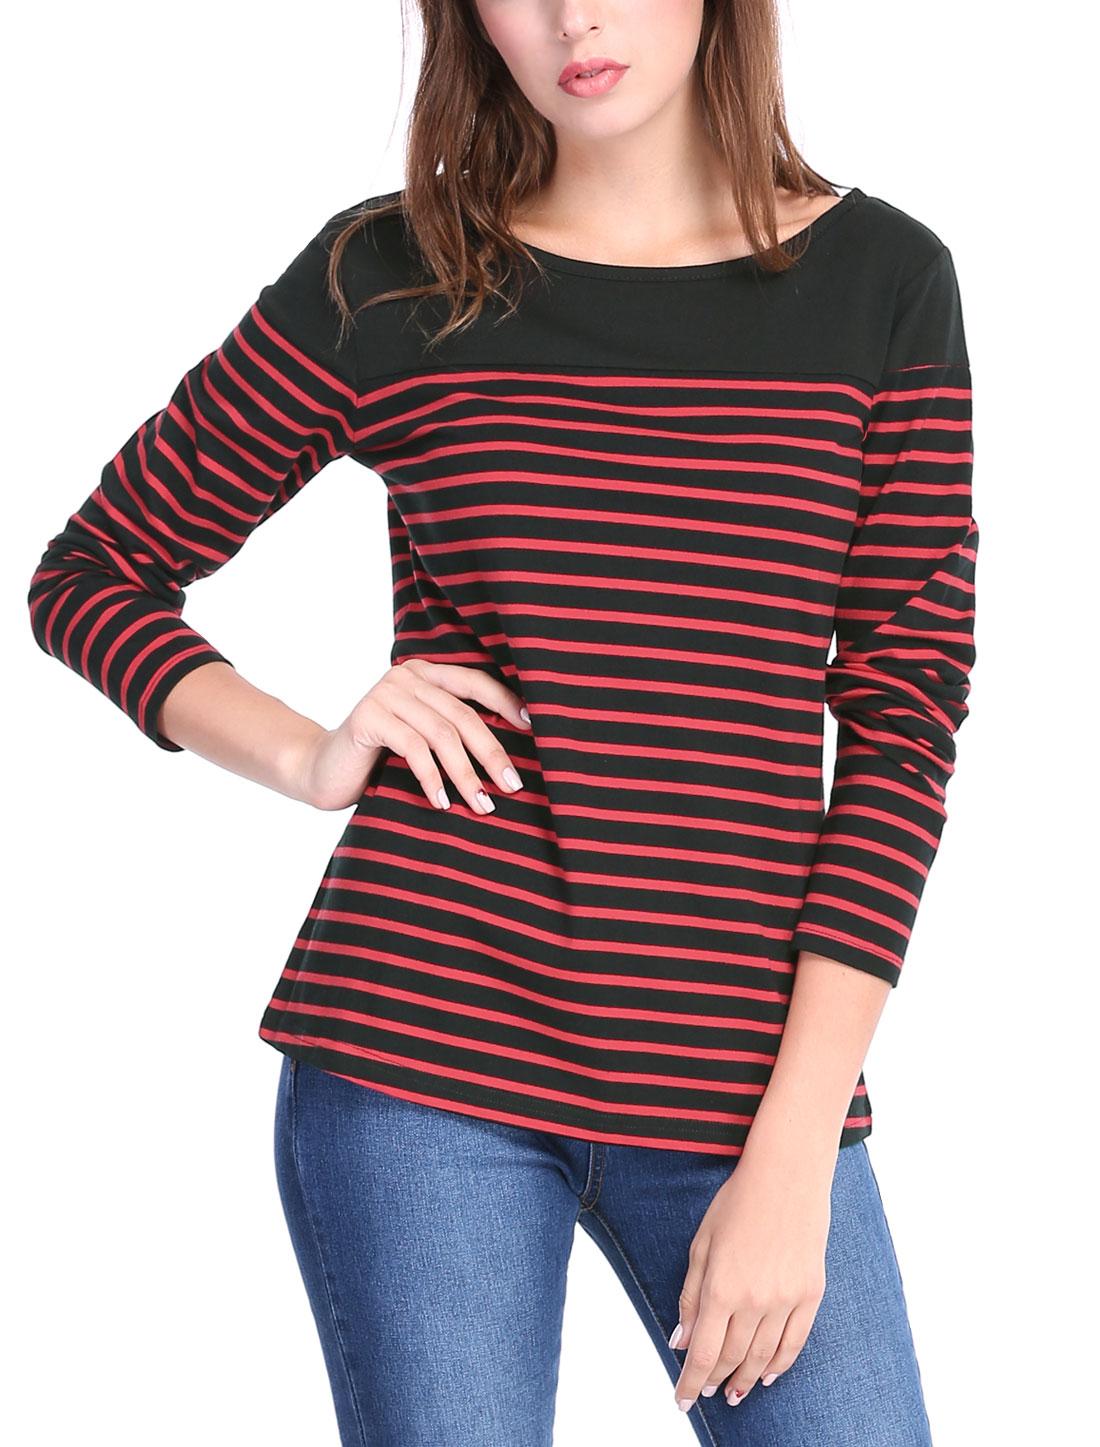 Allegra K Women Classic Striped Long Sleeves Stretch T-Shirt Black Red L